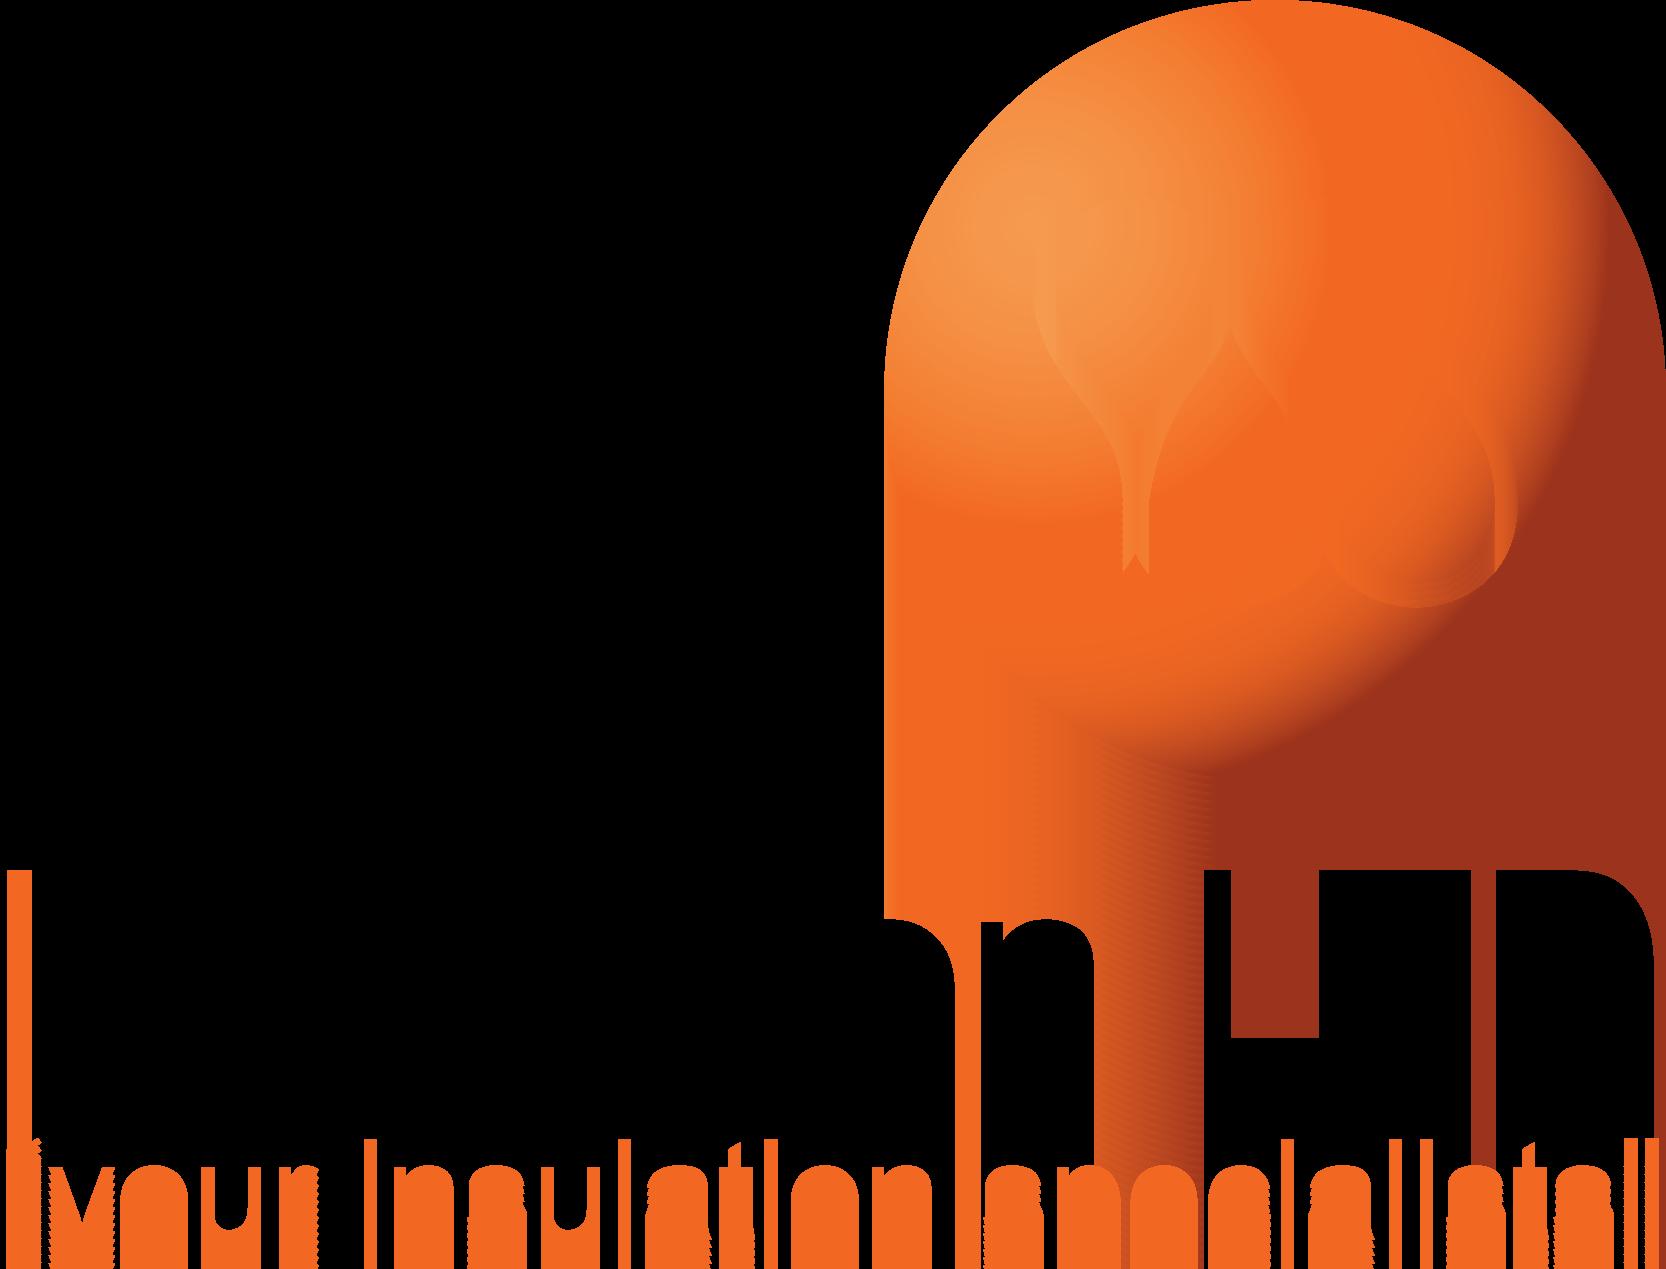 Control Insulation